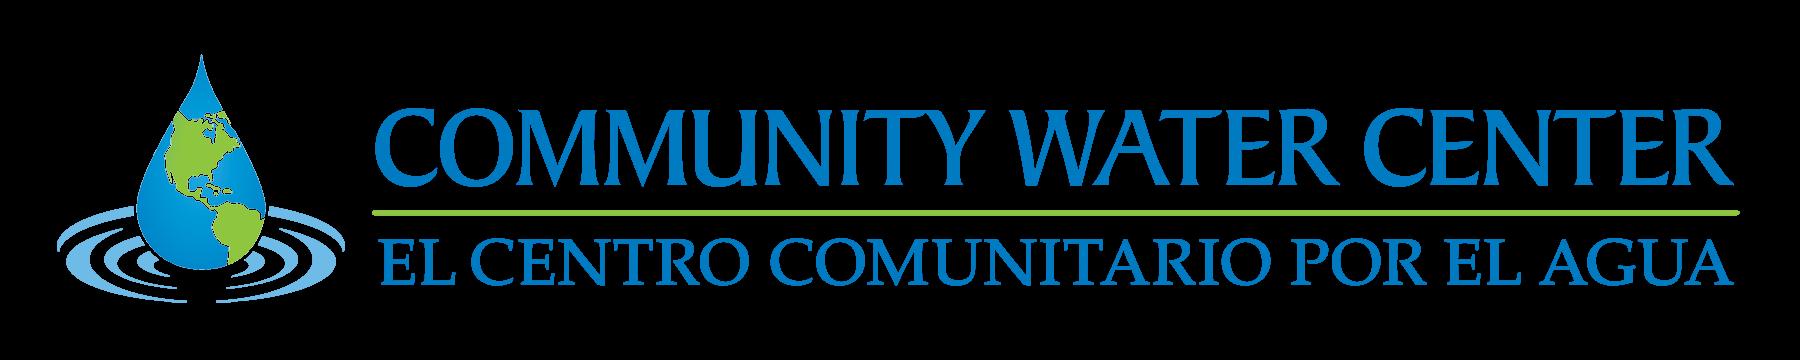 CWC_Logo_1800x360.png